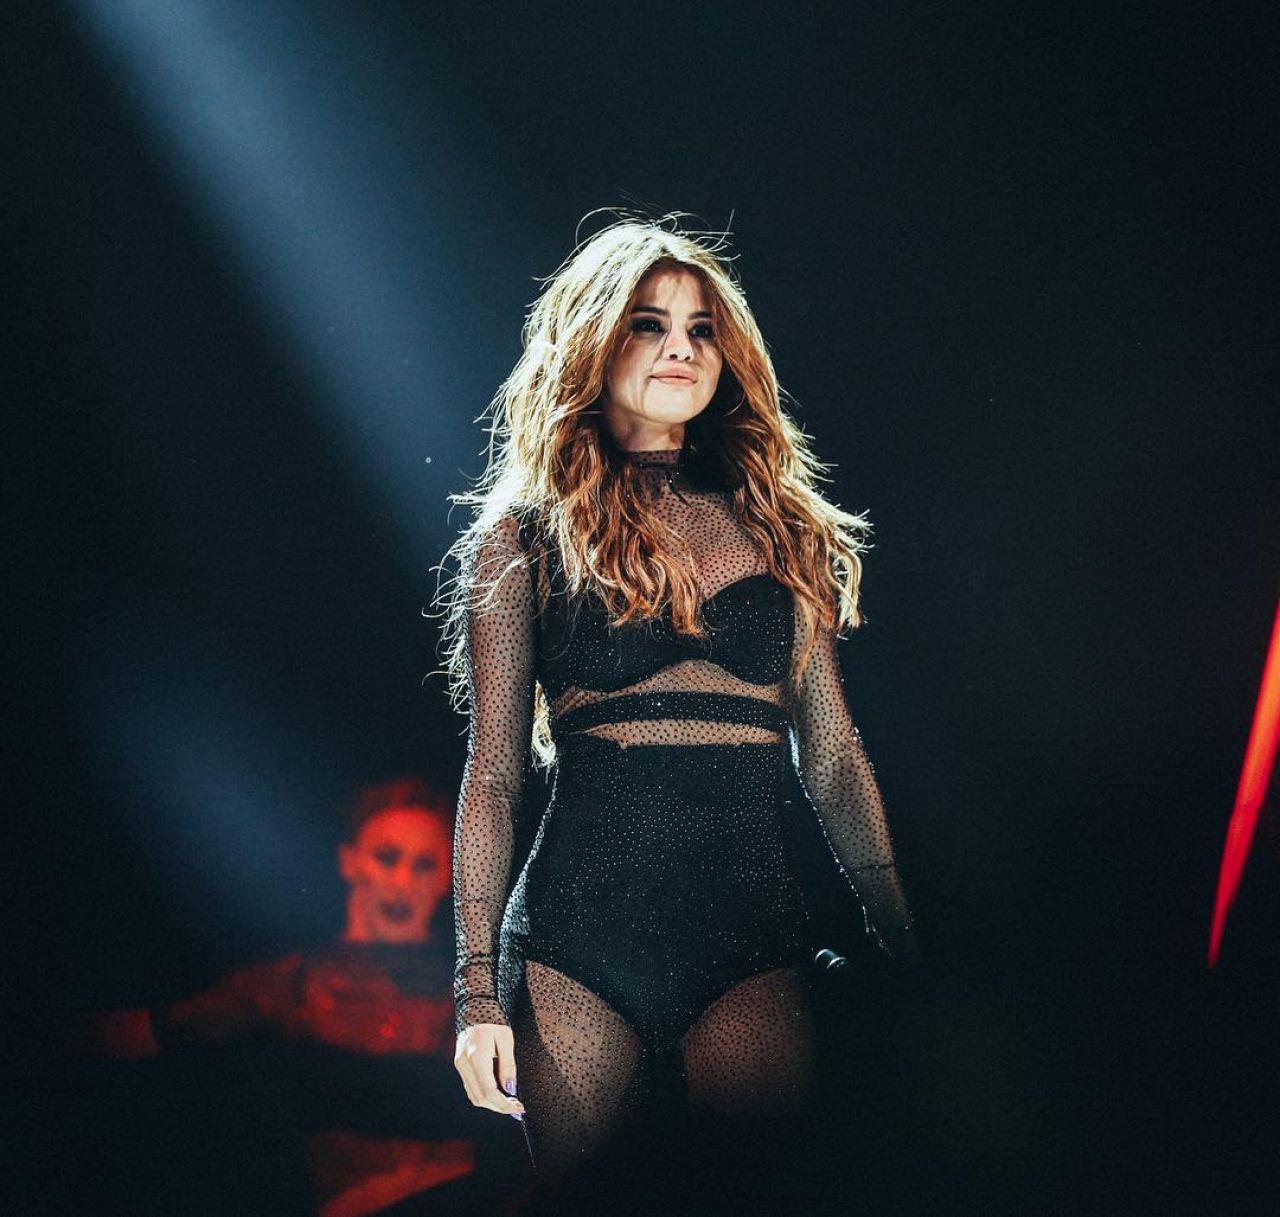 Cum sa fii mai populara pe Instagram – sfaturi de la cea mai urmarita vedeta, Selena Gomez